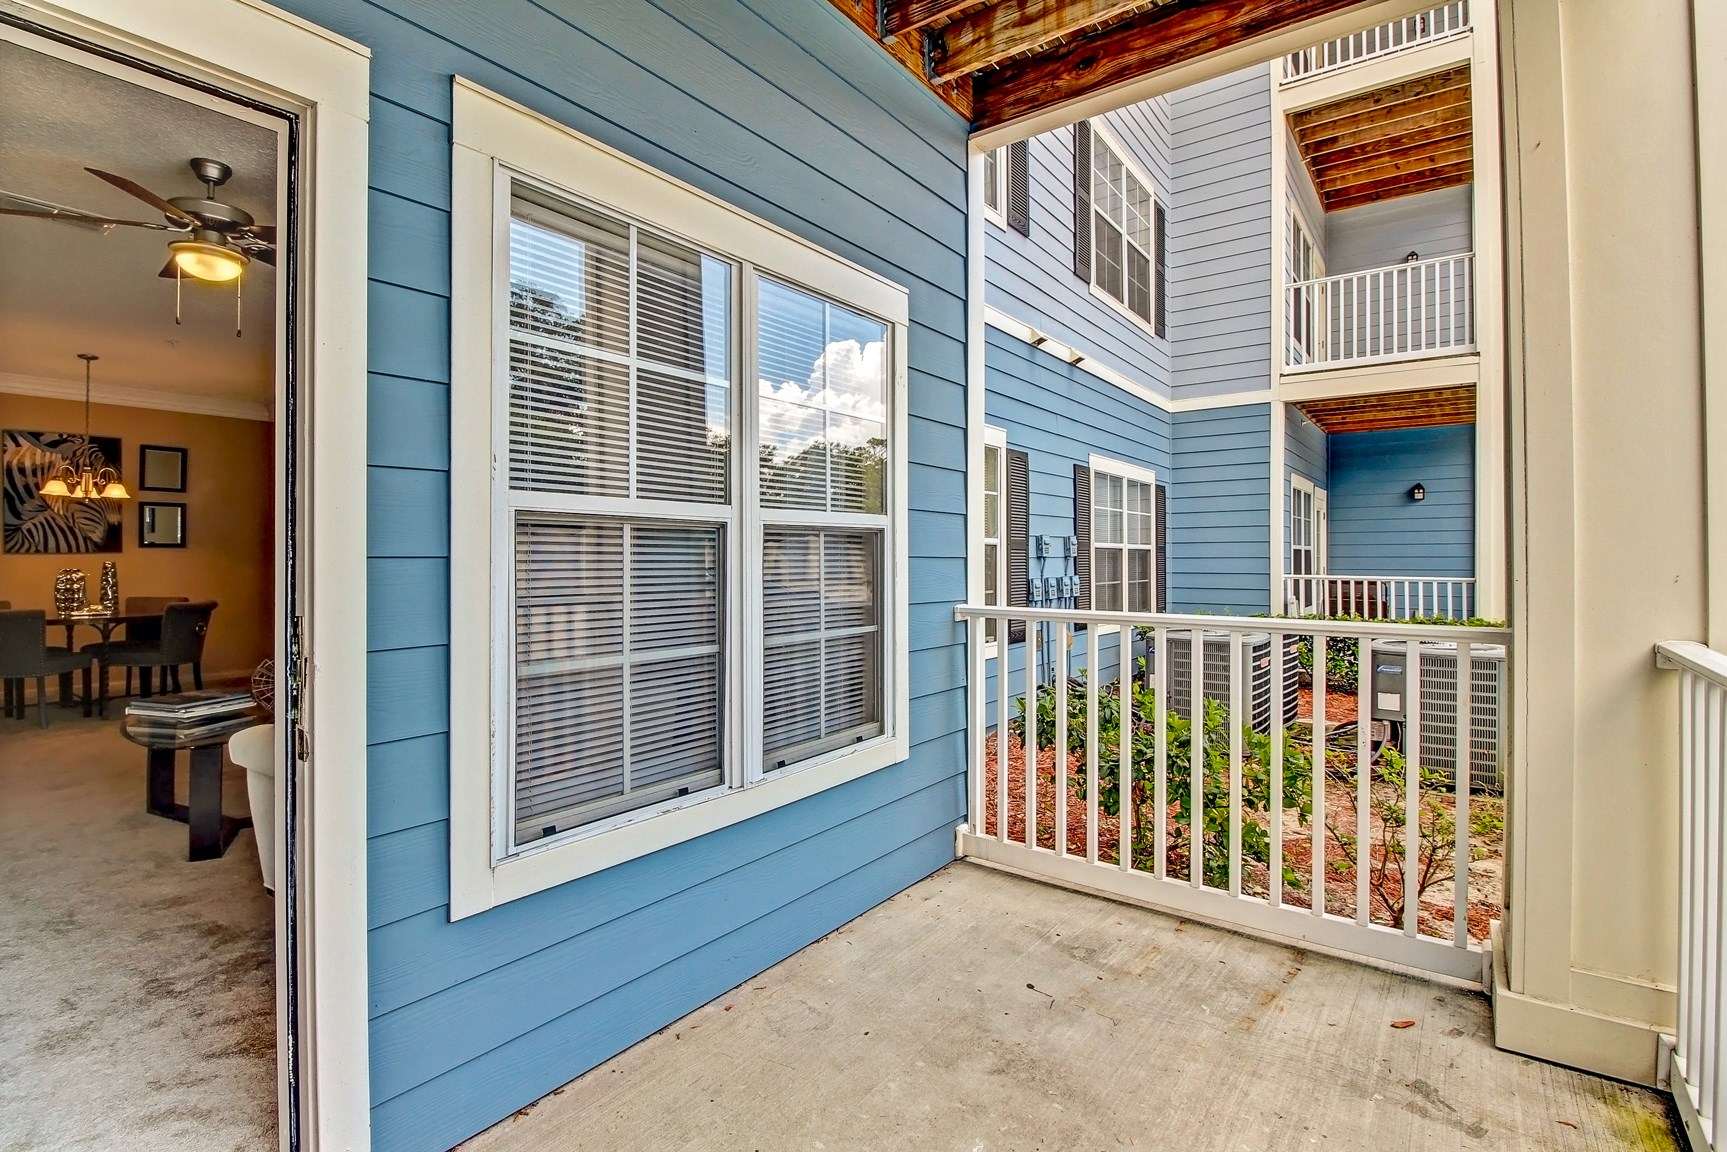 Balcony at Magnolia Village Apartments in Jacksonville, FL